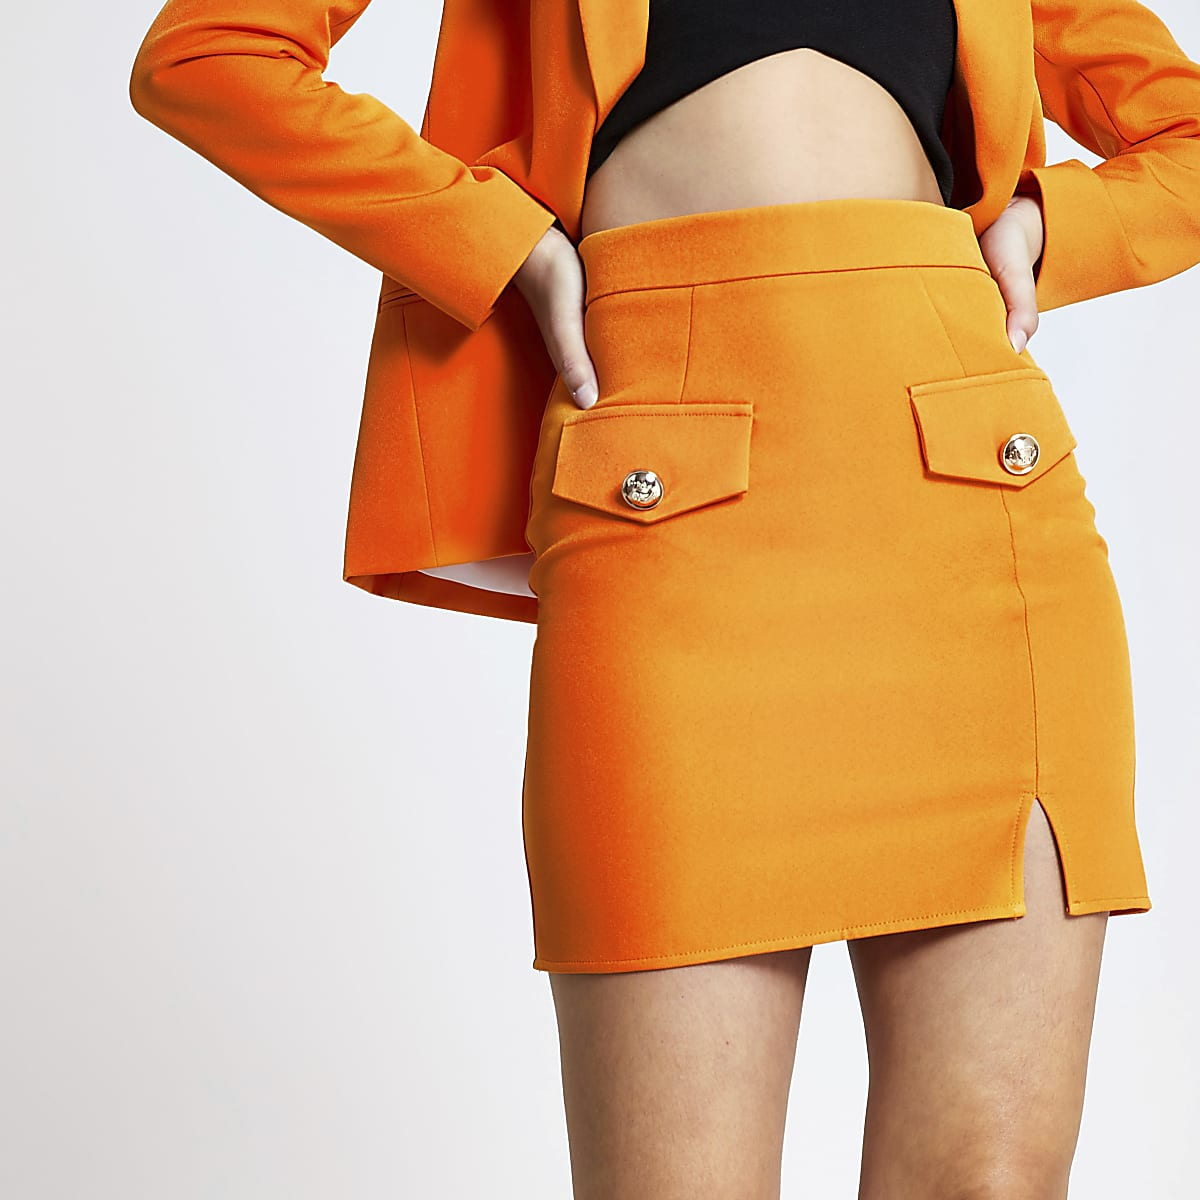 Orange A line mini skirt